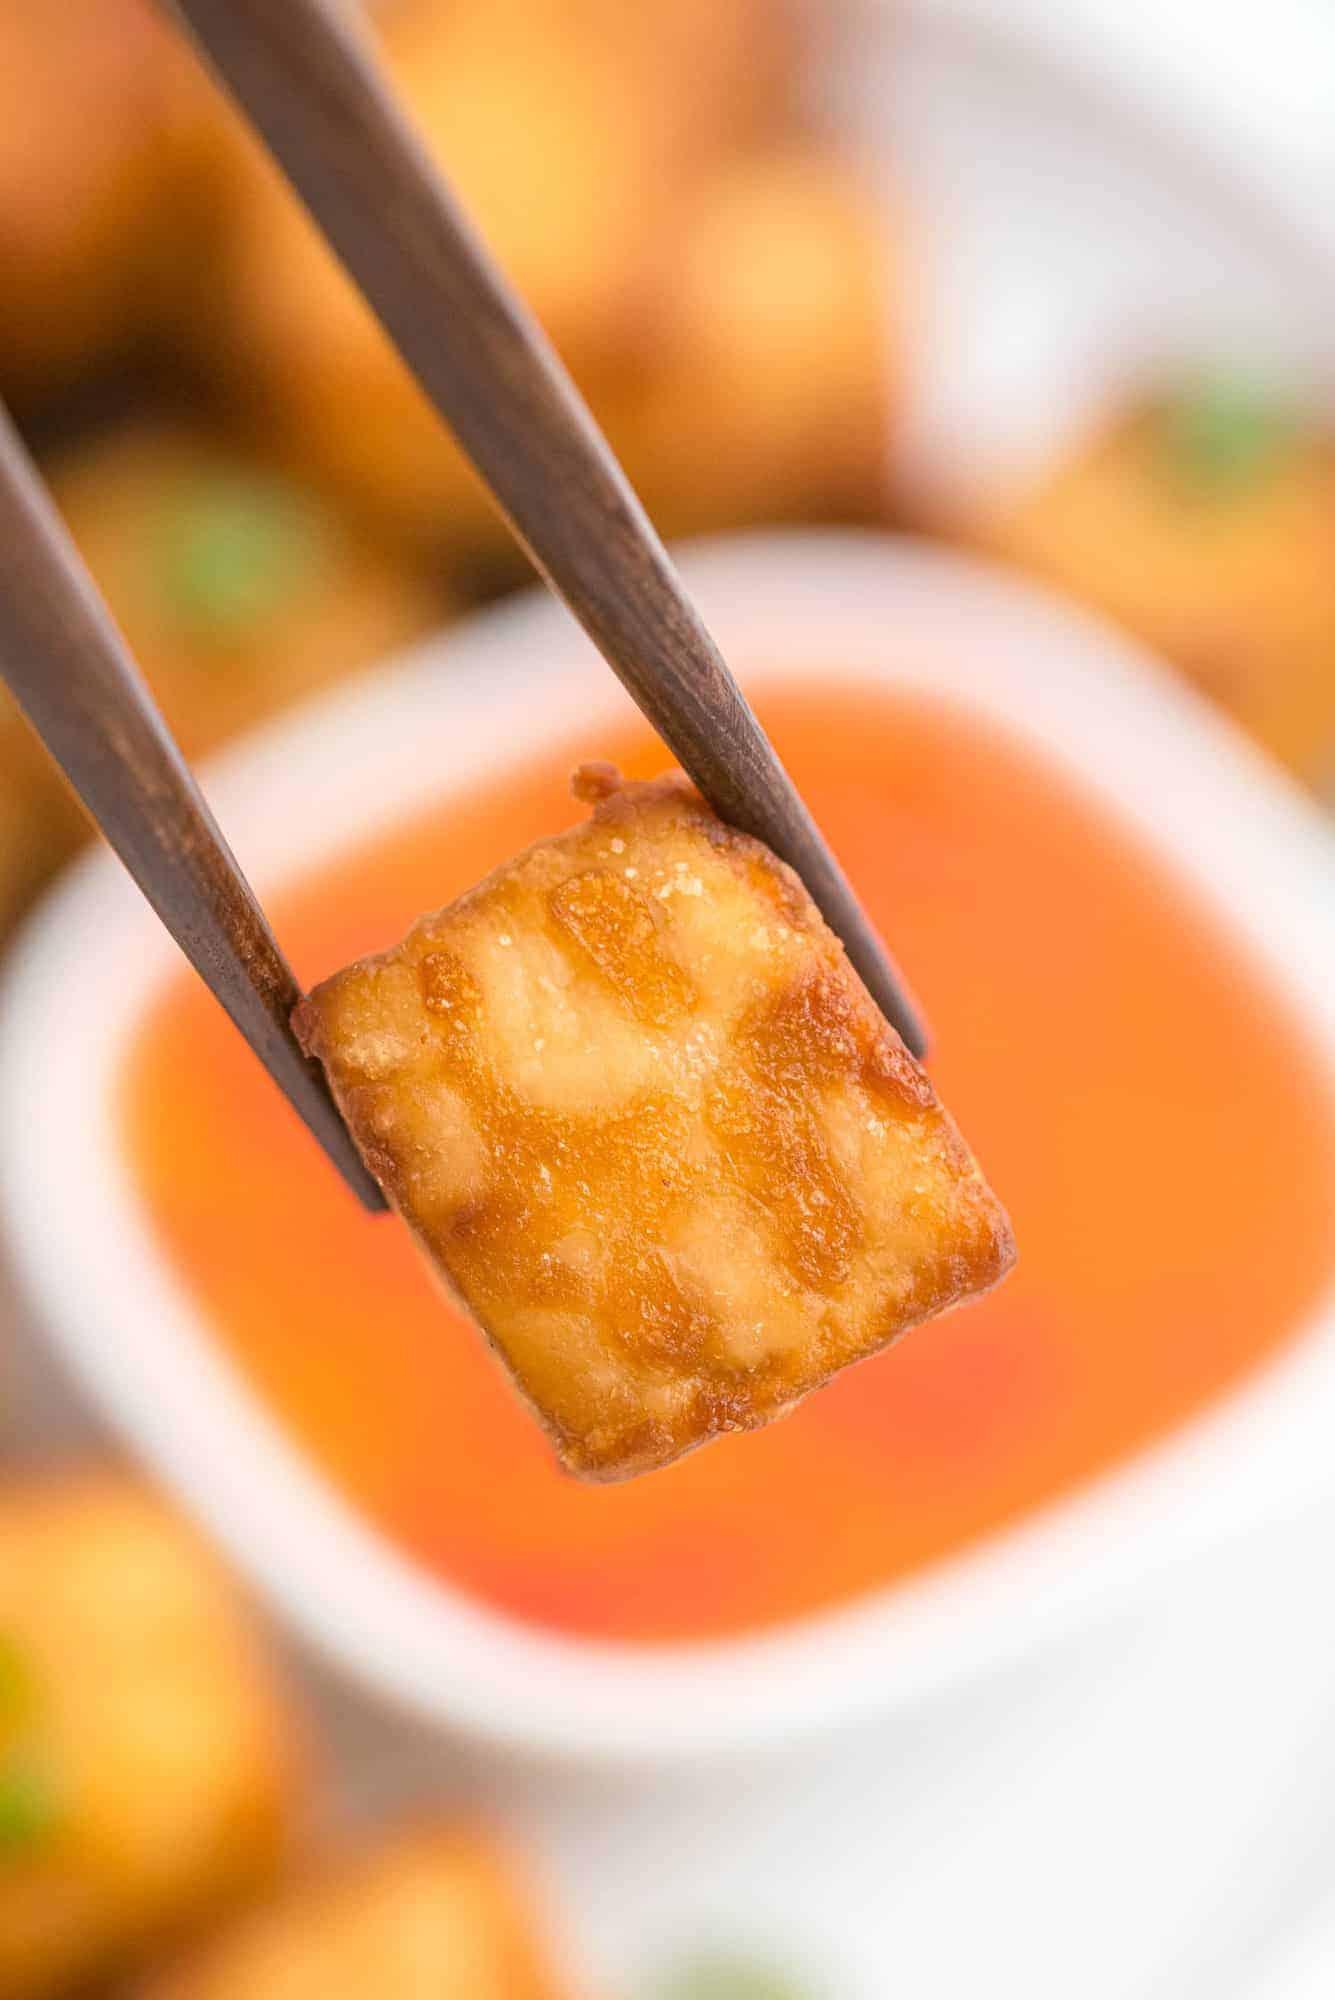 Crispy piece of tofu held between brown chopsticks.